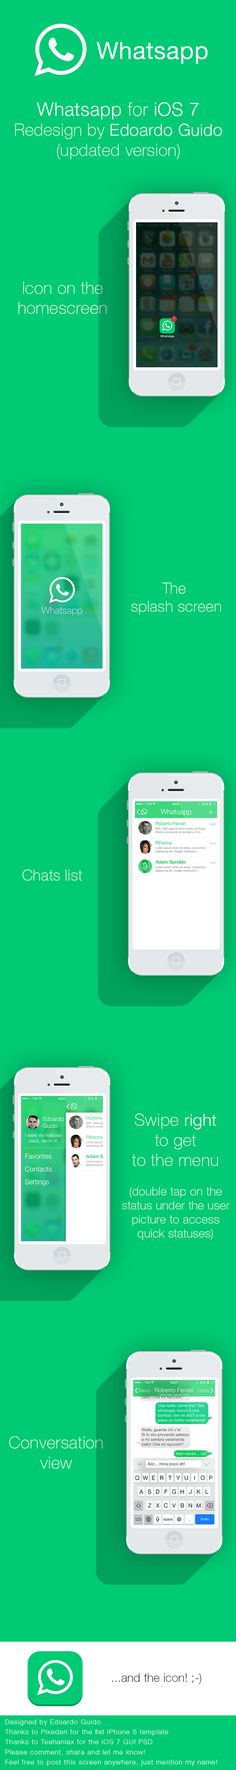 Whatsapp for iOS 7 [REUPDATED] by Edoardo Guido, via Behance